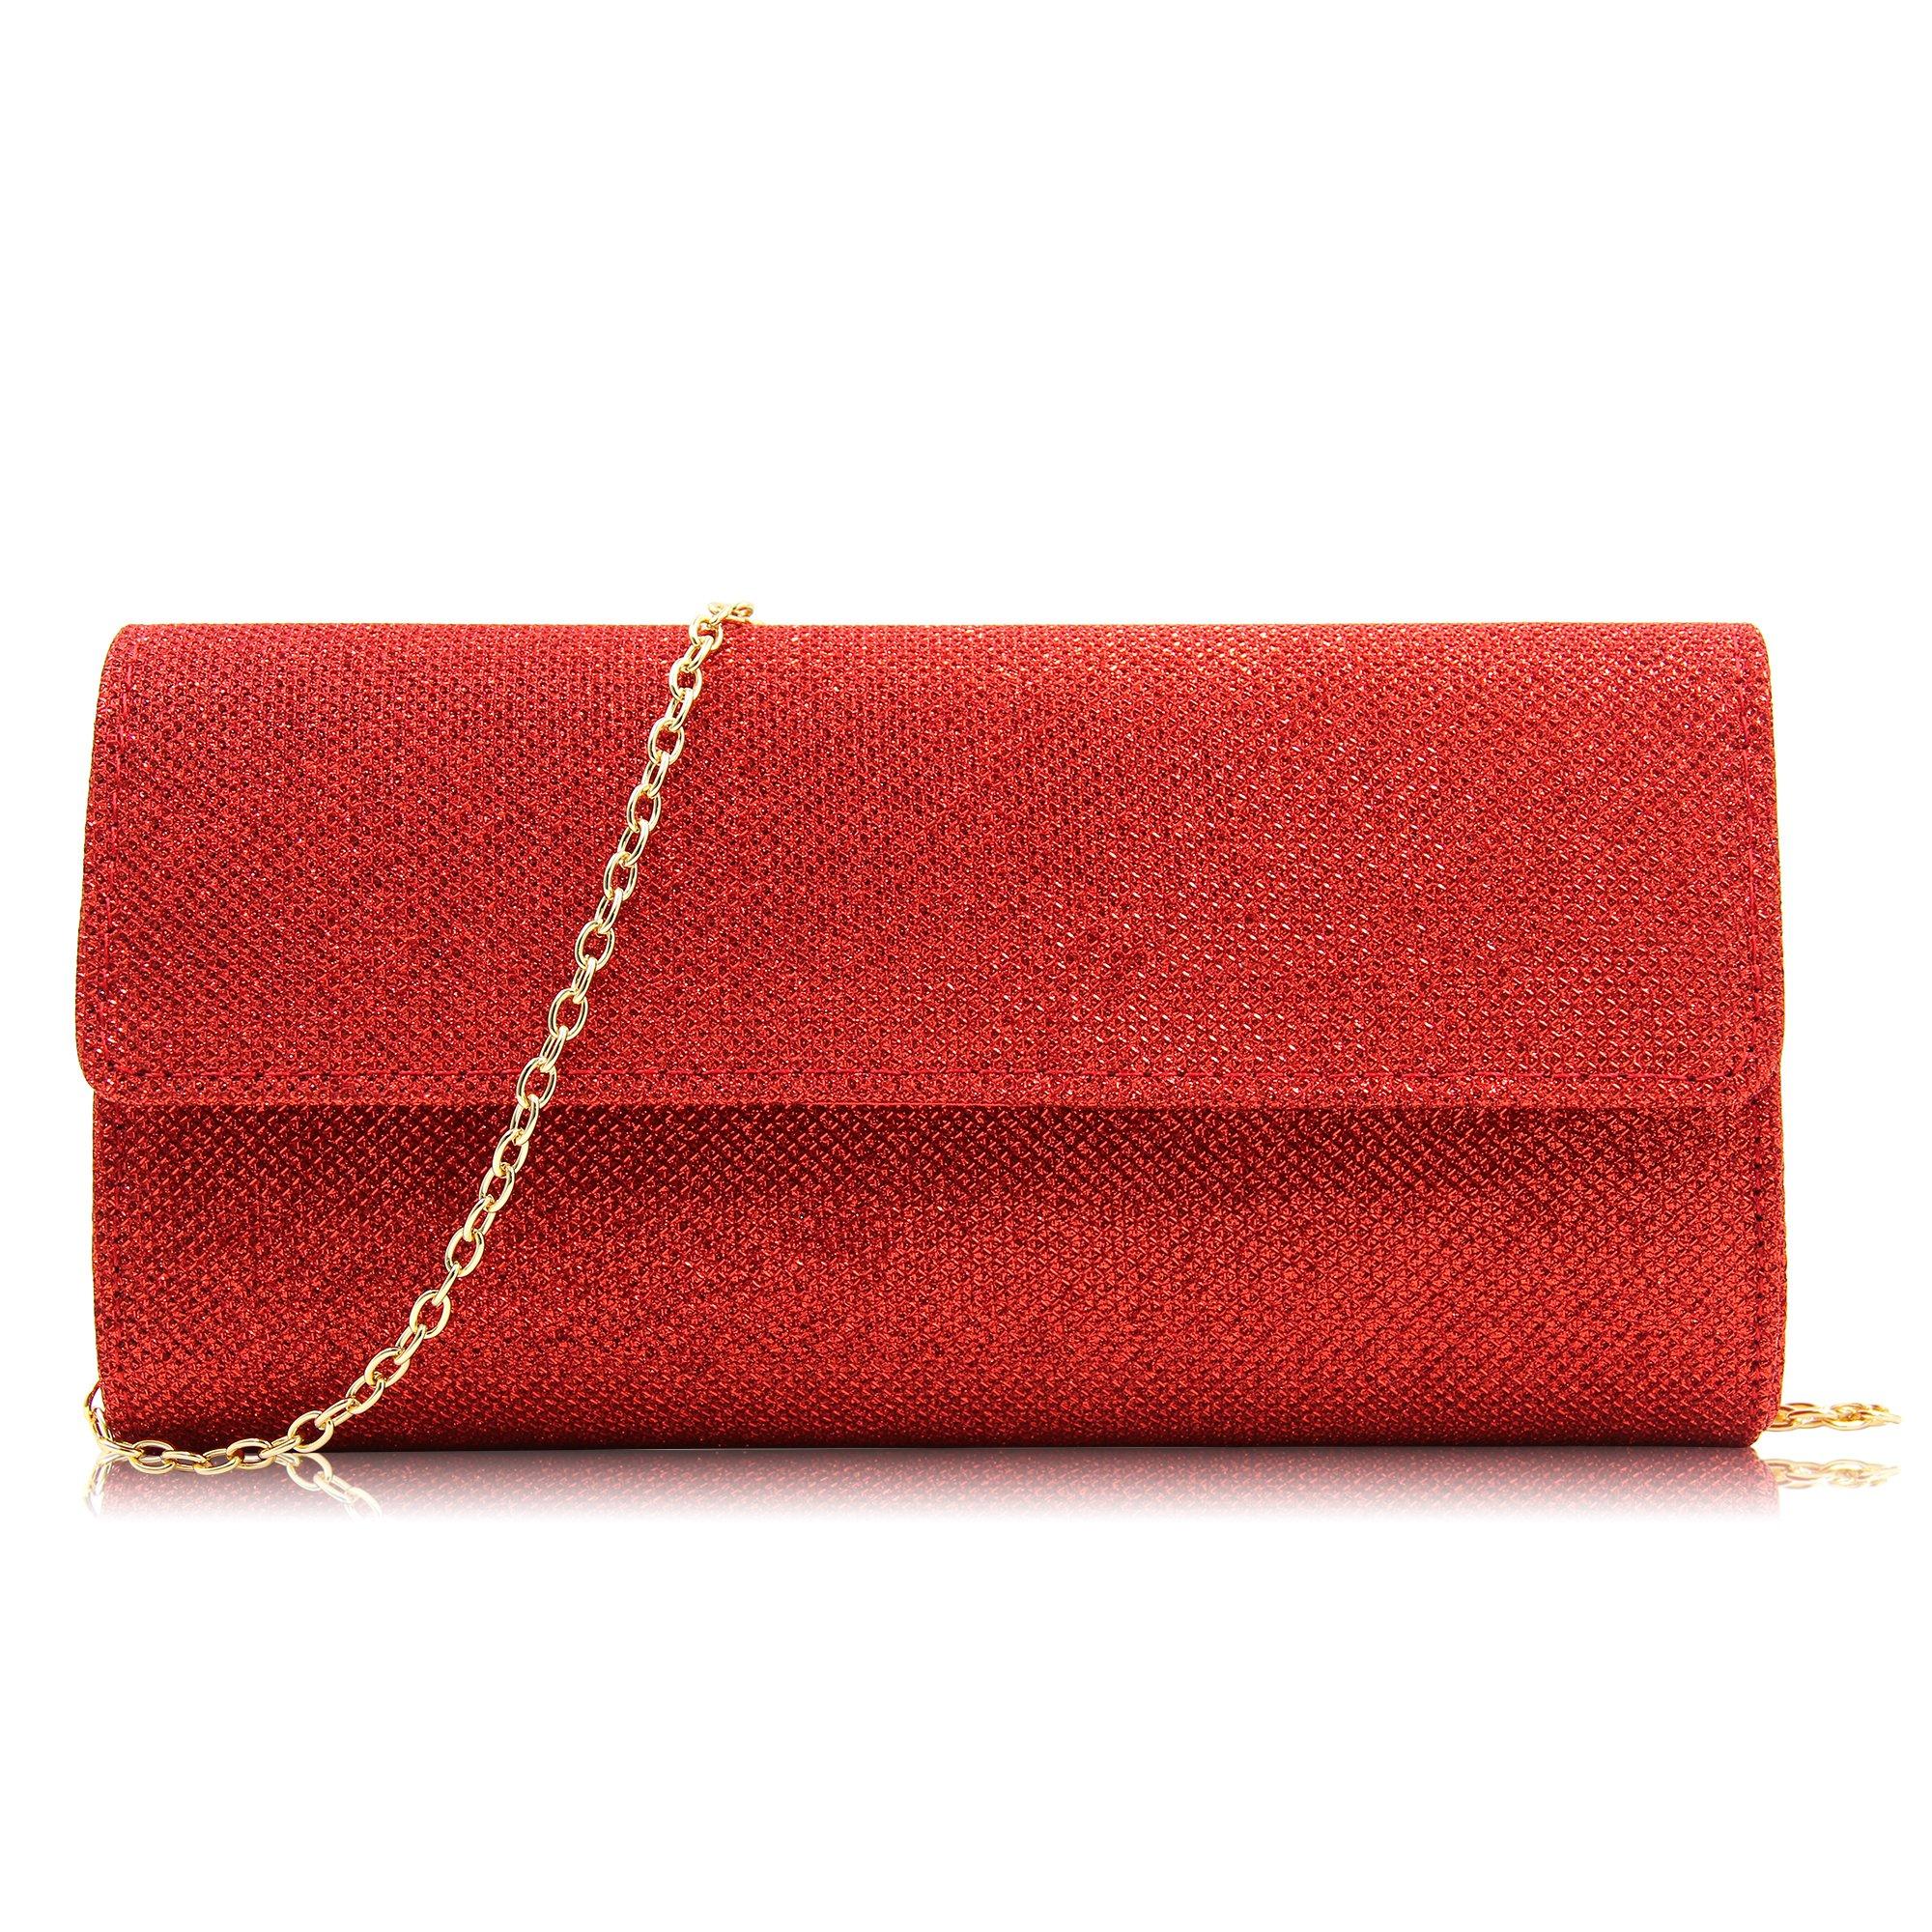 Milisente Women Clutches Elegant Sequins Evening Bag Chain Clutch Purse (Red)